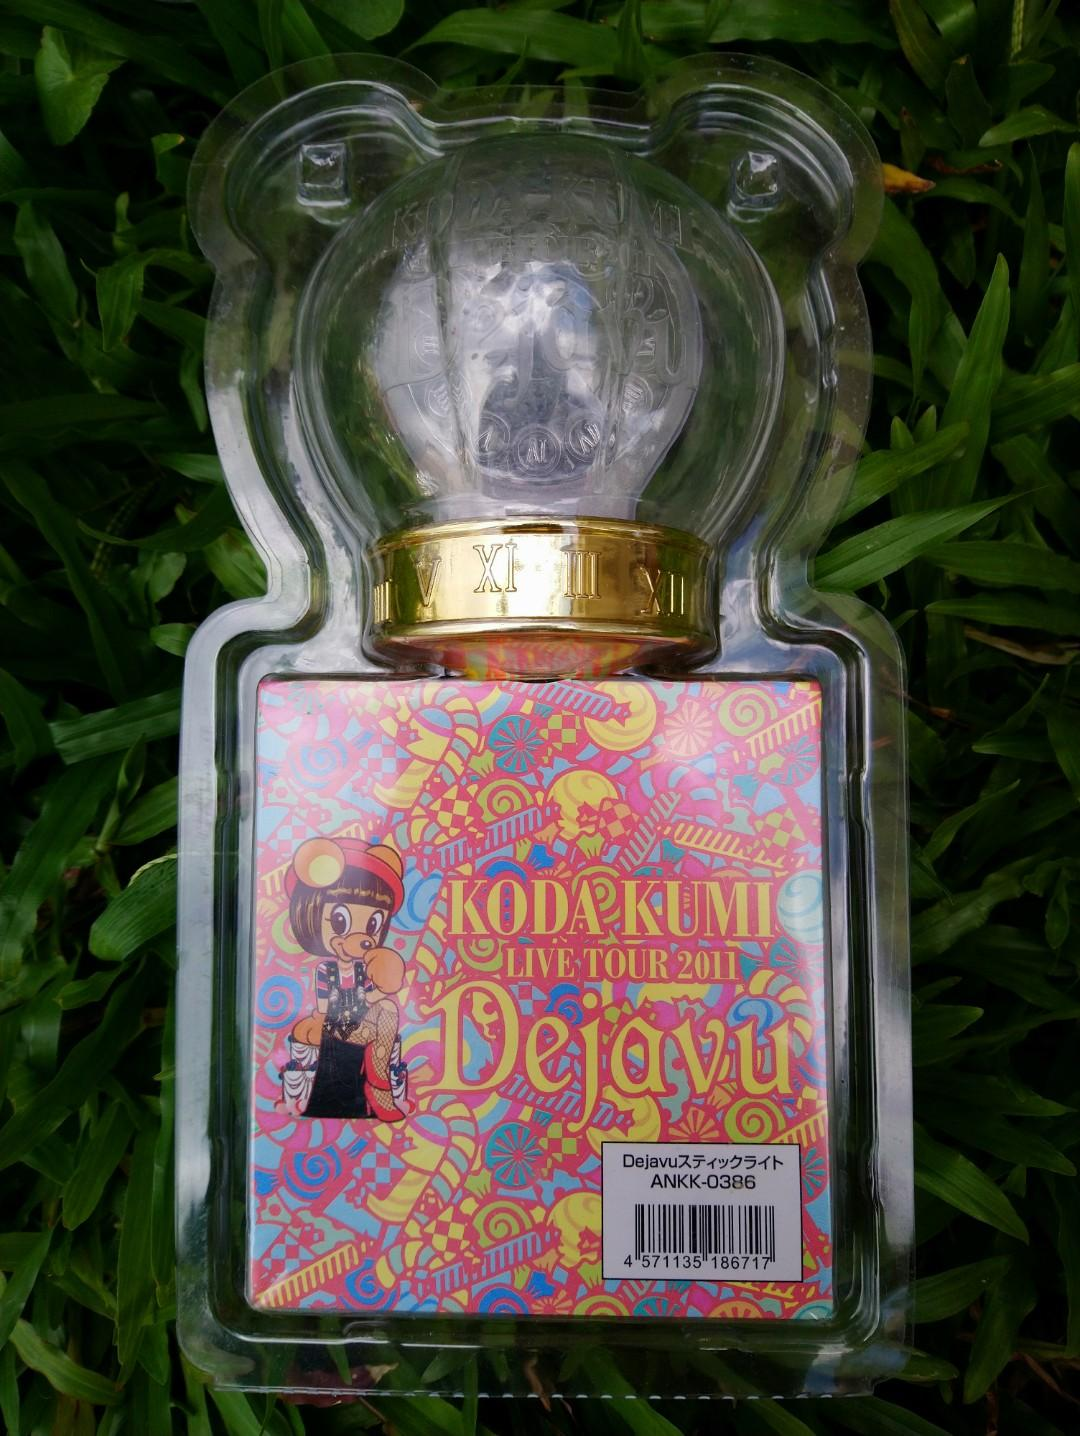 KODA KUMI/倖田來未-LIVE TOUR 2011 DEJAVU-Stick Light(Official Collectibles)-**with free Souvenir-FREE SHIPPING